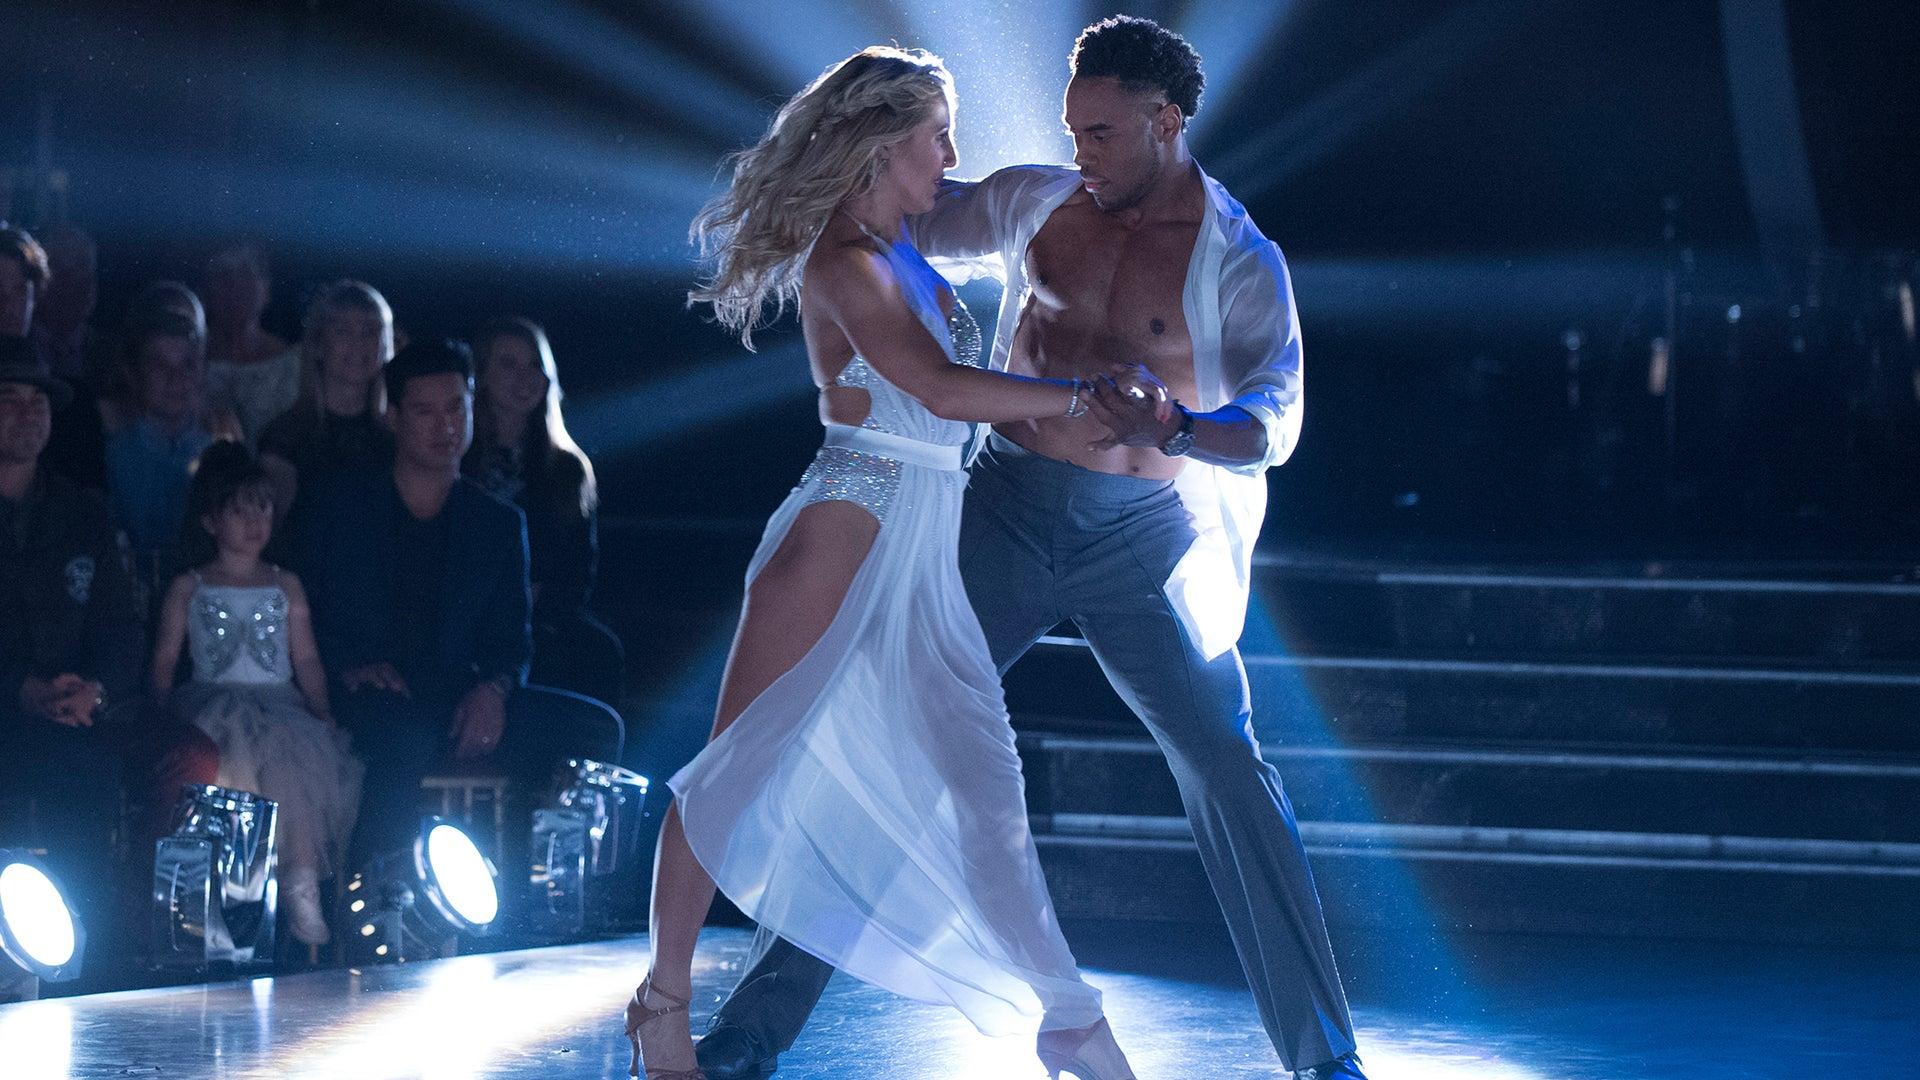 Rashad Jennings, Dancing with the Stars